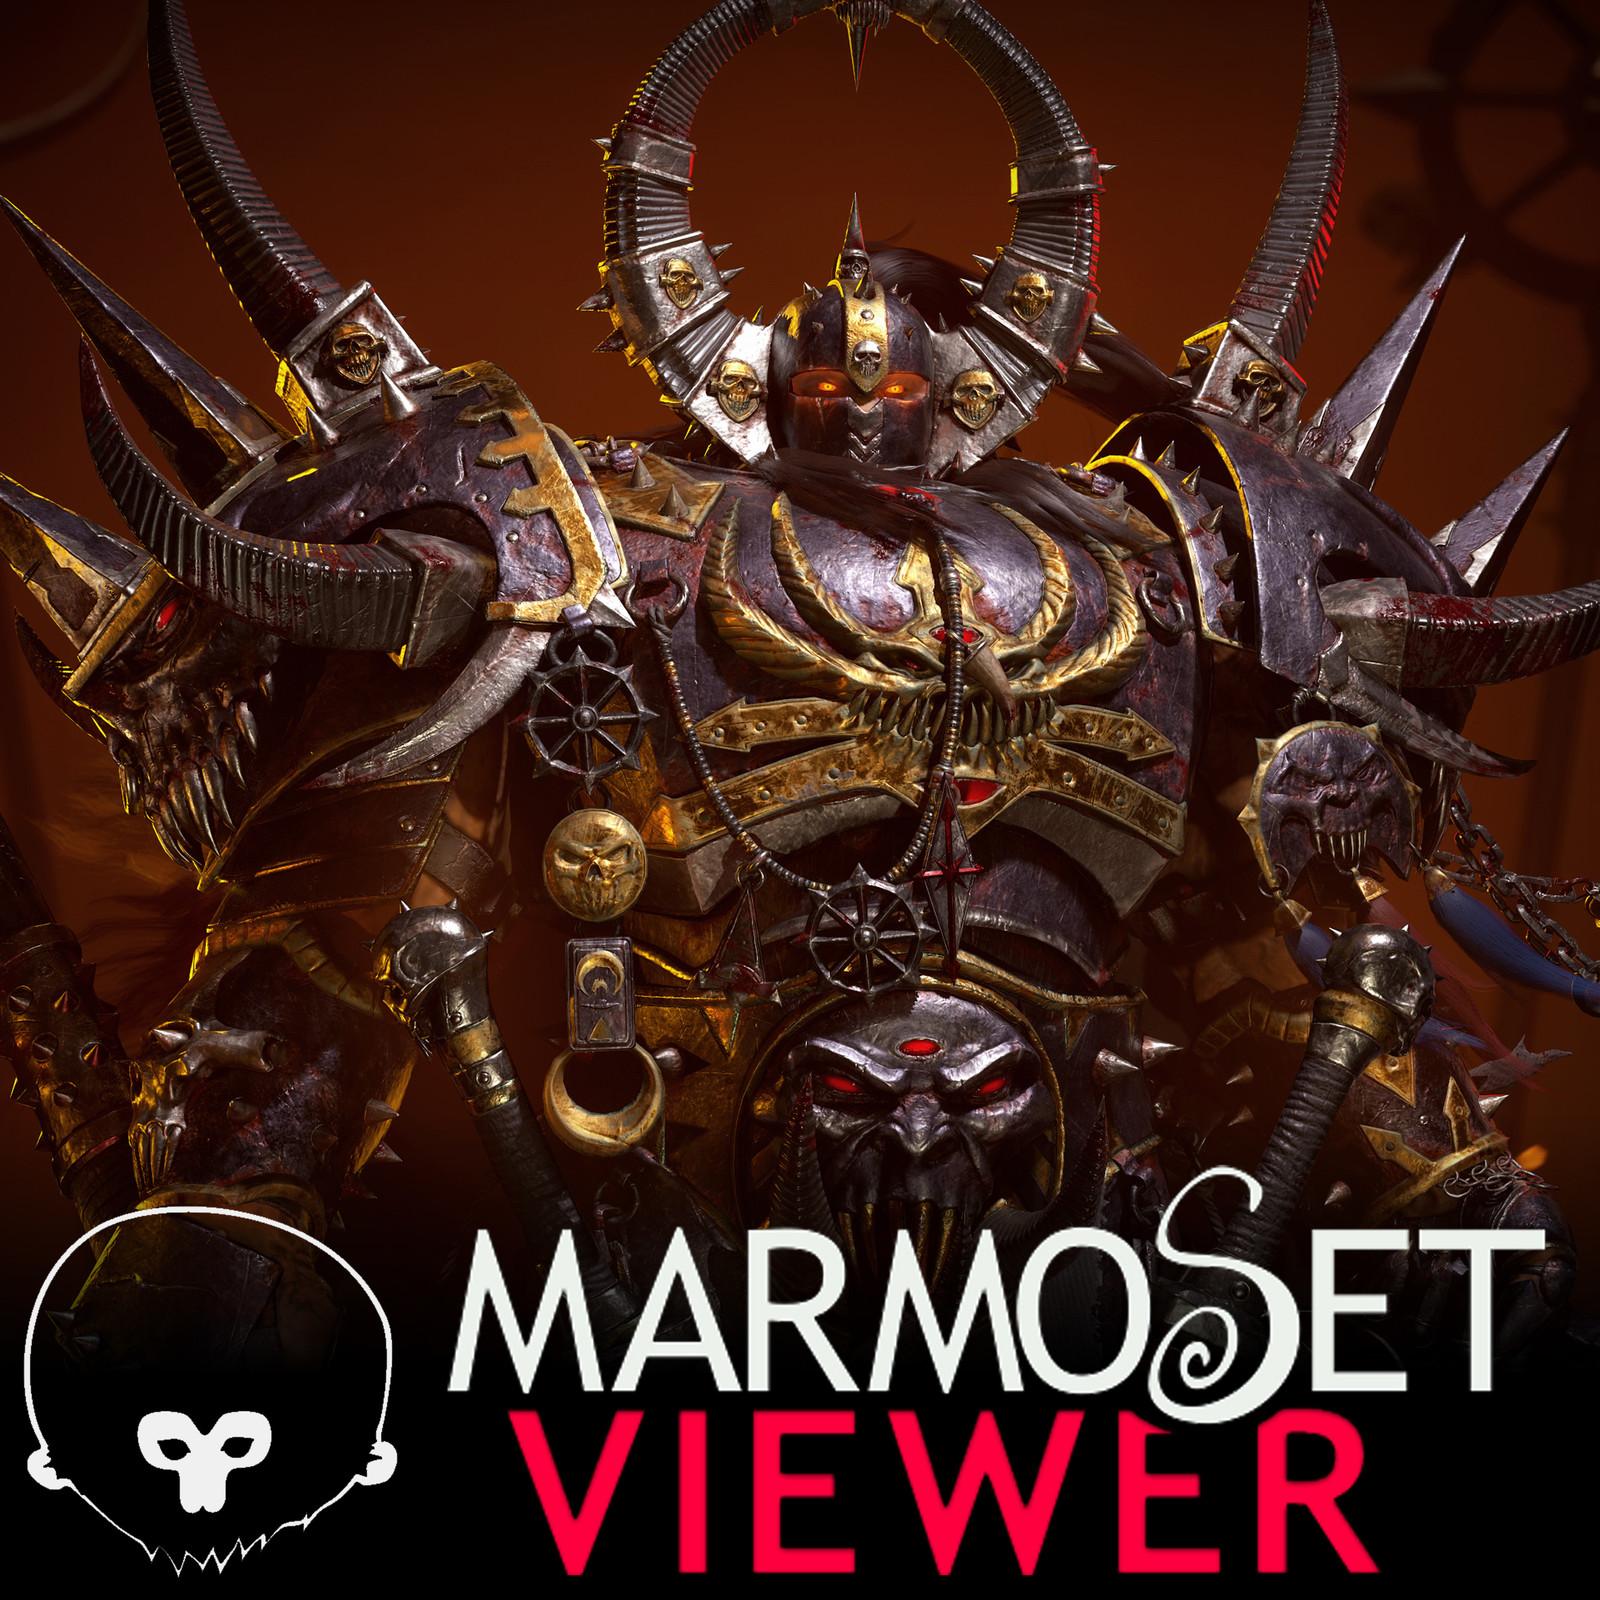 Engra Deathsword - Marmoset Viewer